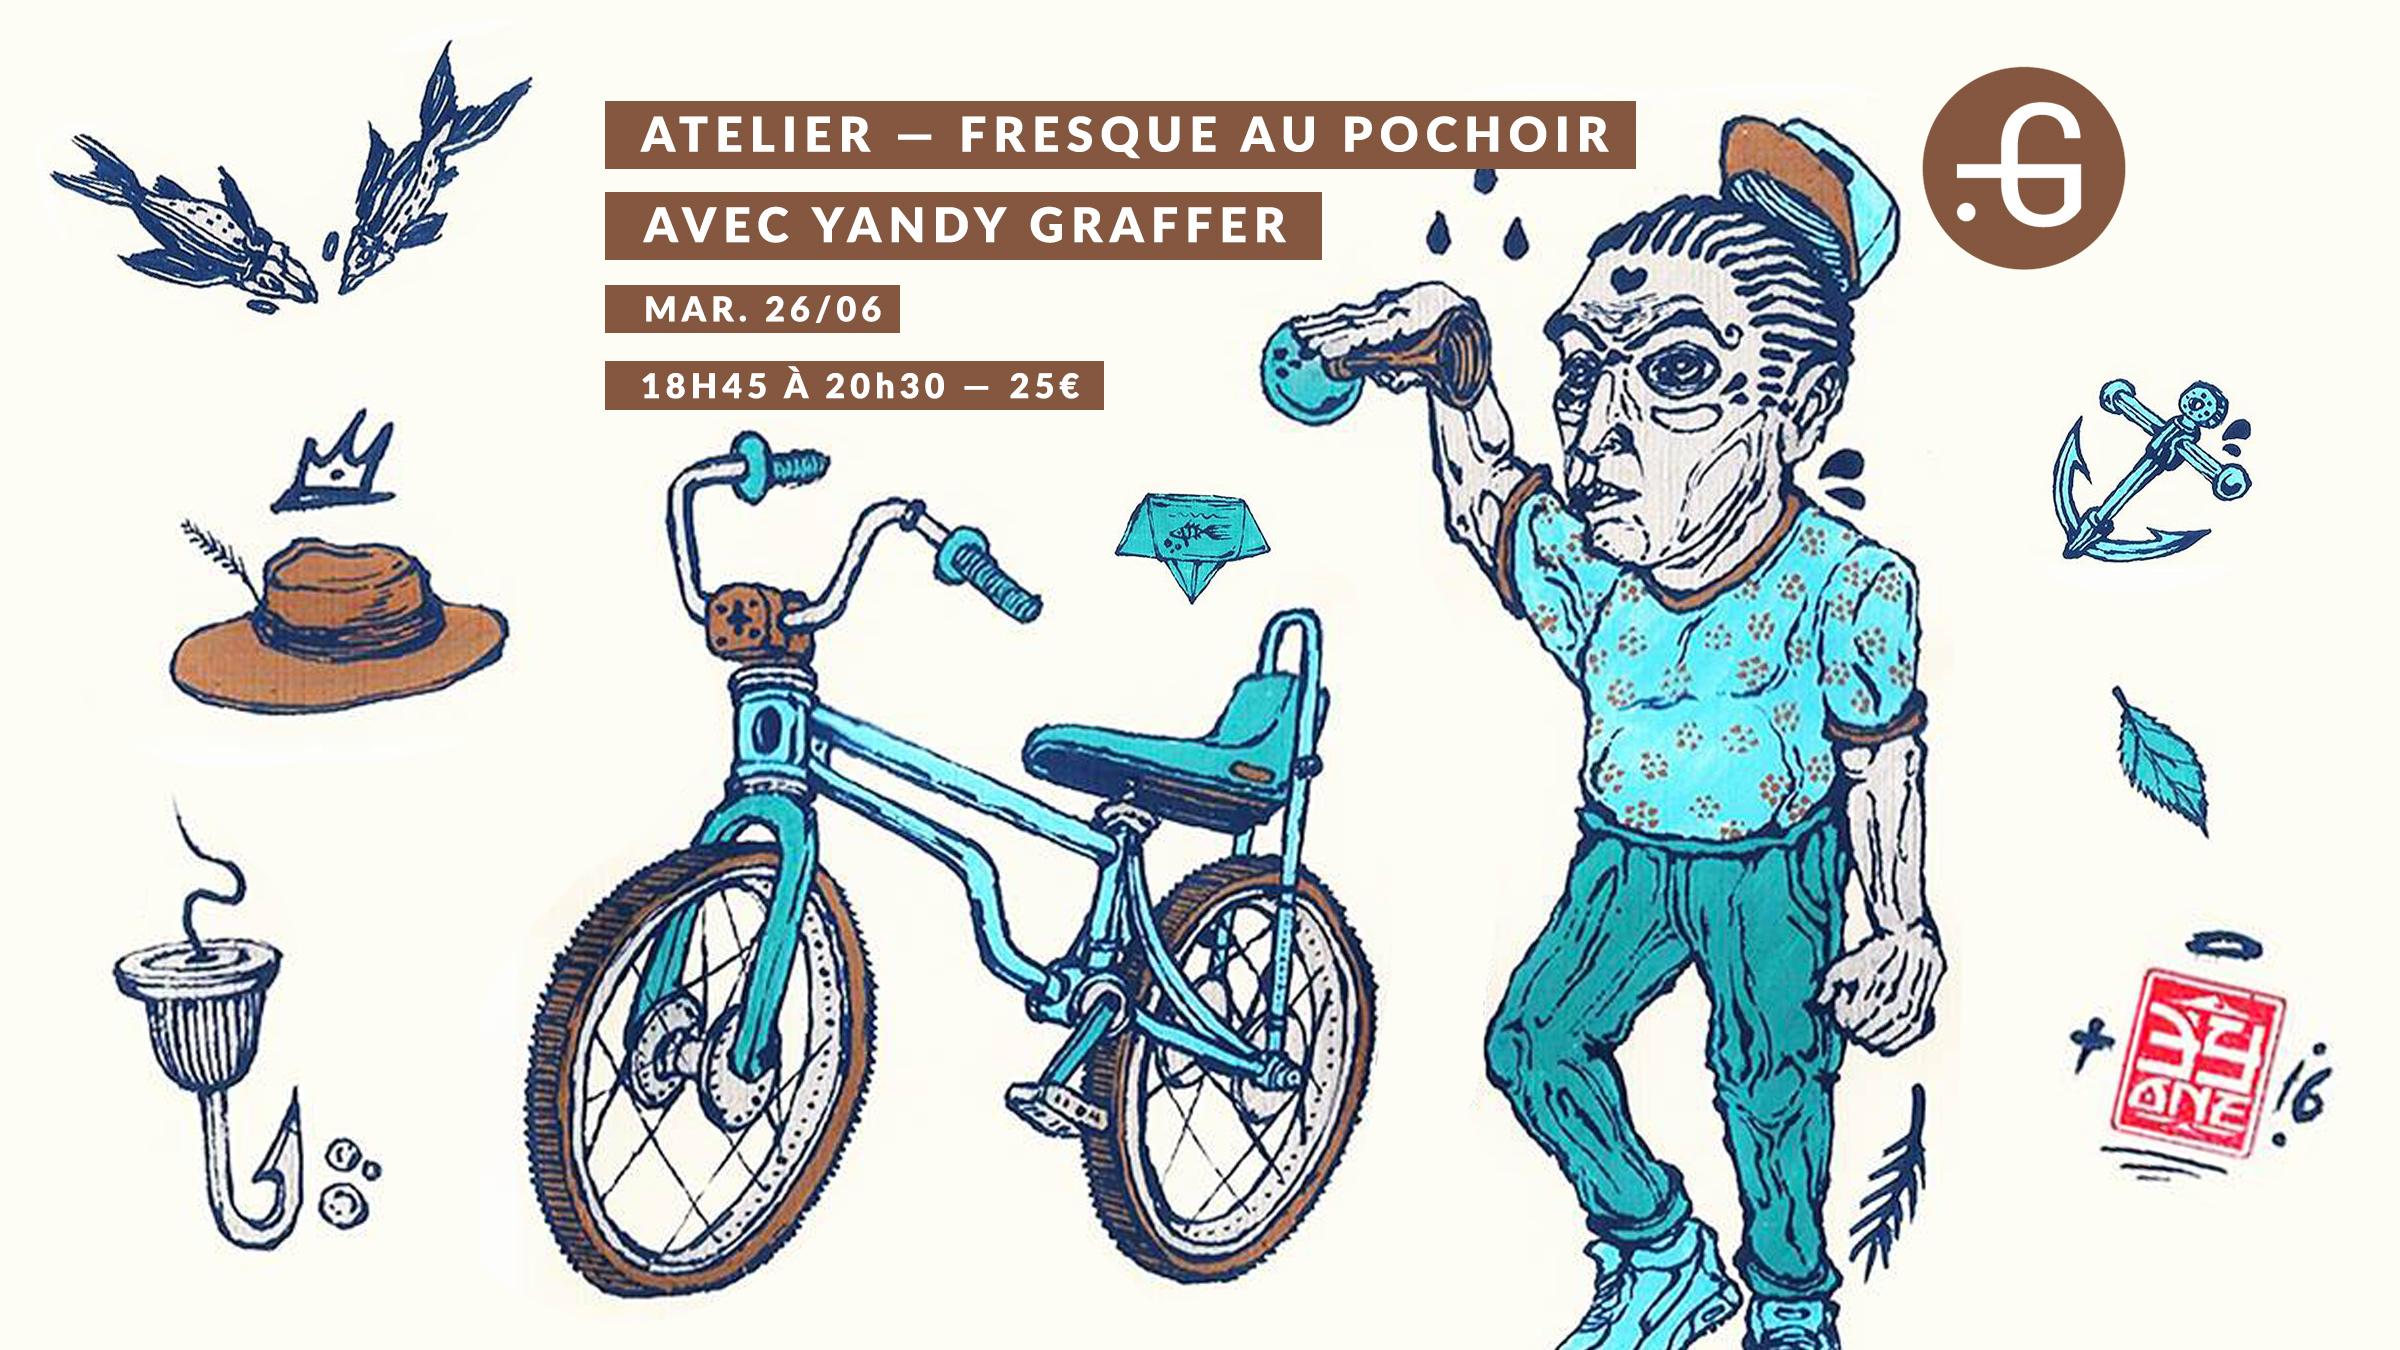 Atelier pochoir, yandy graffer 26/06